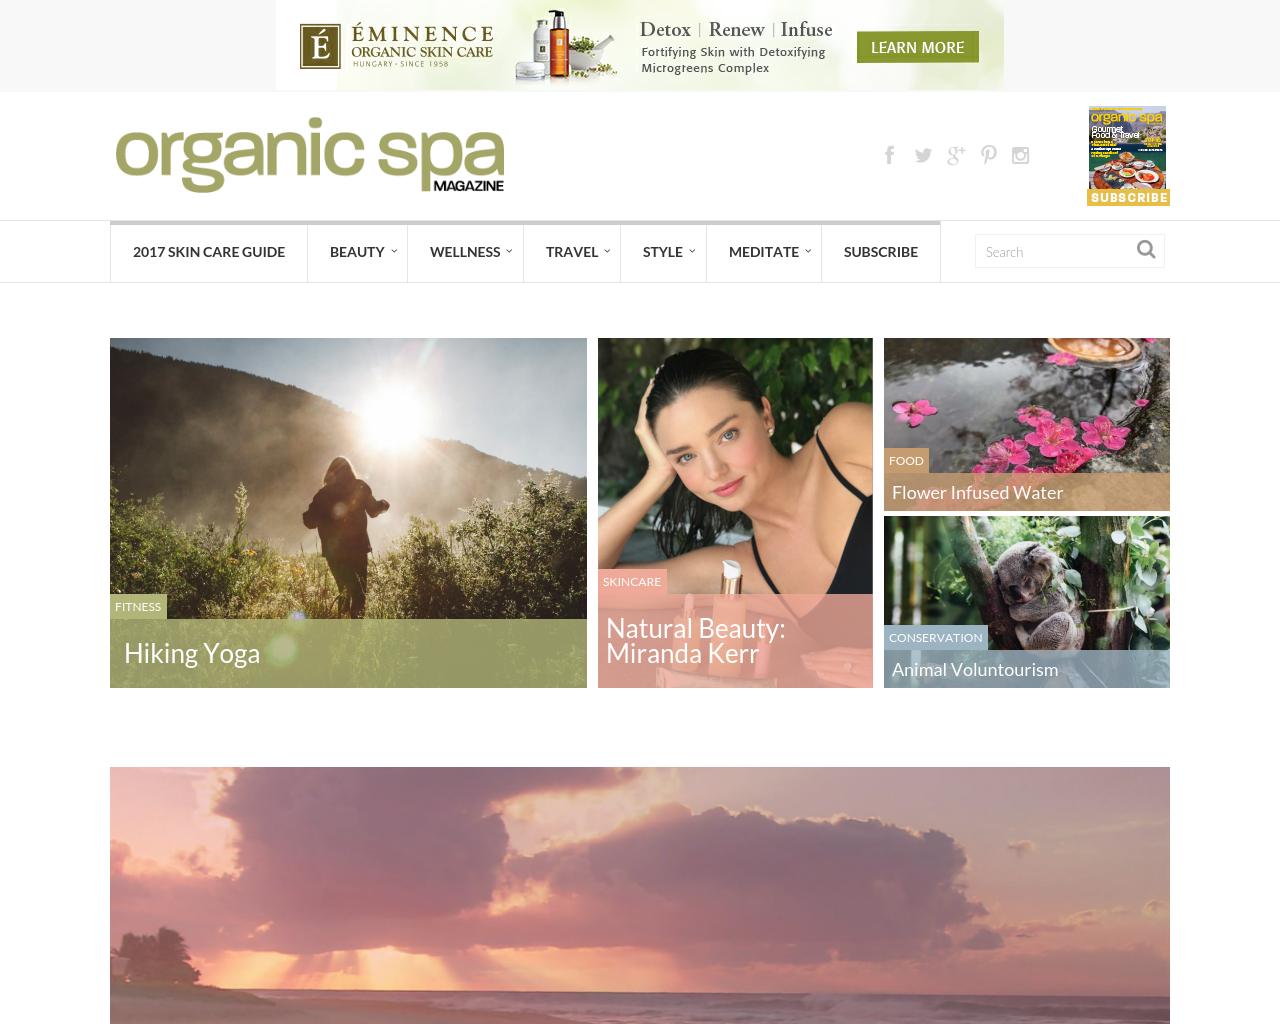 Organic-Spa-Magazine-Advertising-Reviews-Pricing